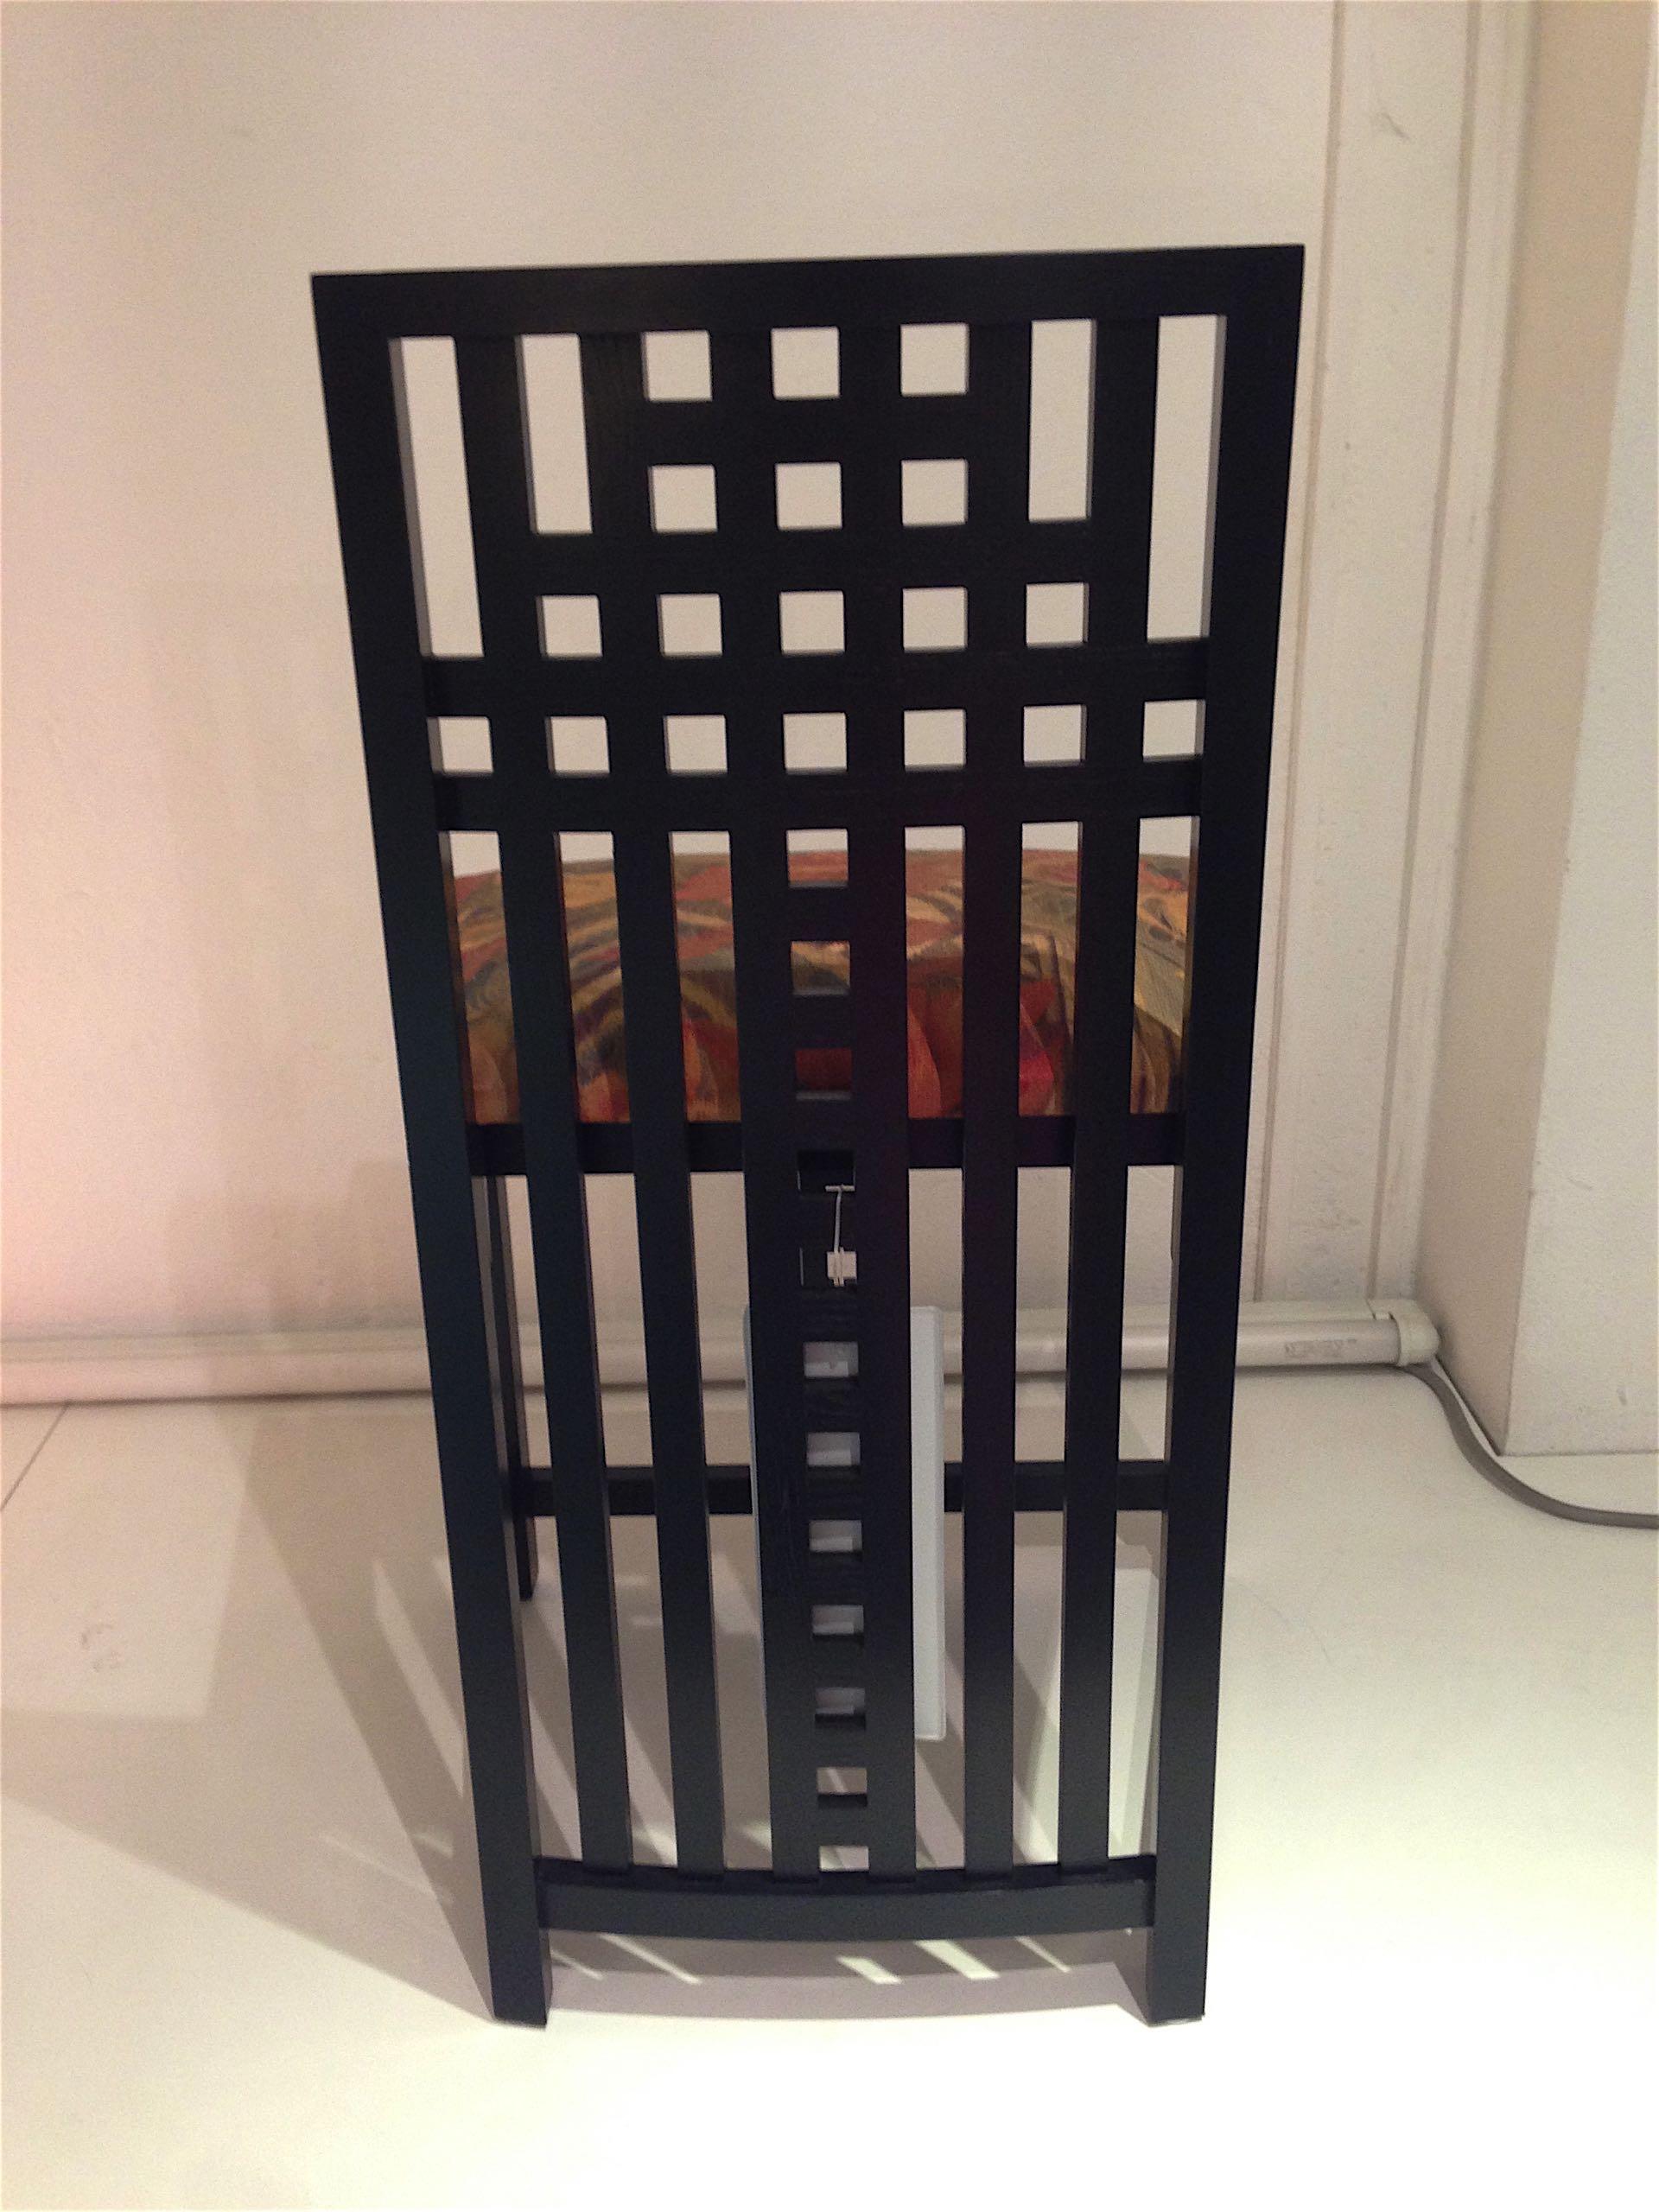 seduta design Charles Rennie Mackintosh original Cassina Made in Italy